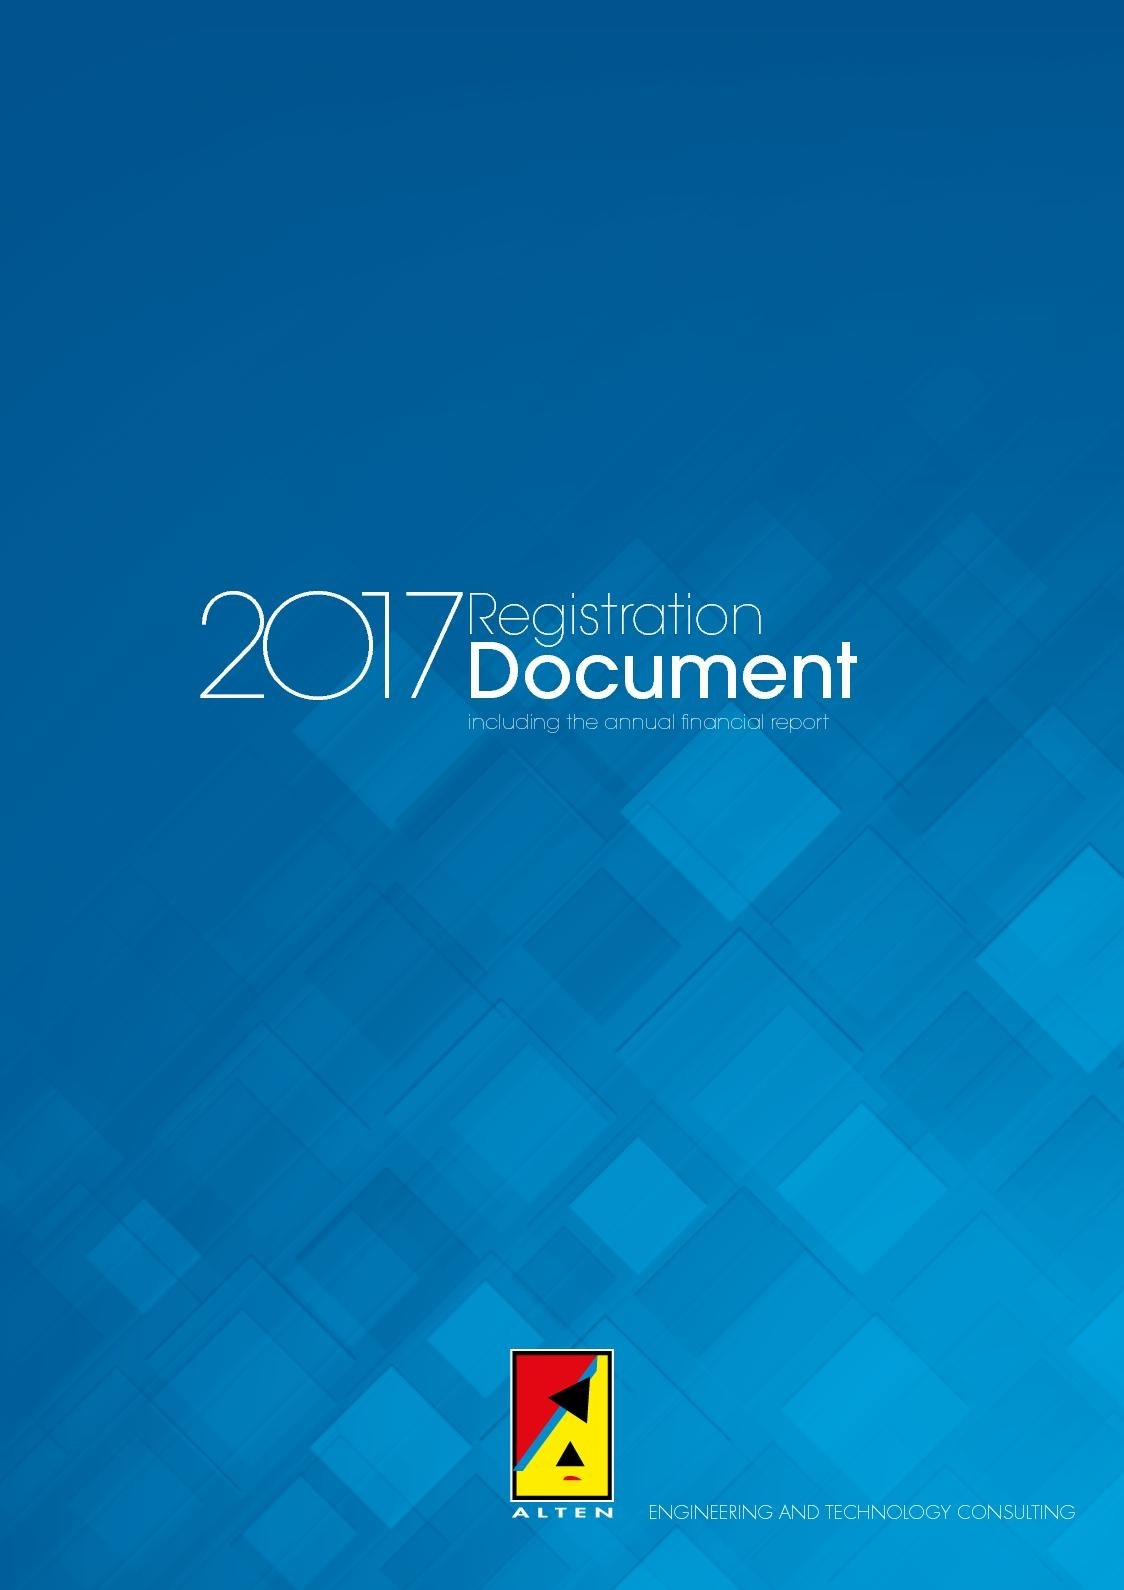 Calaméo - 2017 Alten Registration Document  Financial Year Calendar 2021/19 Australia